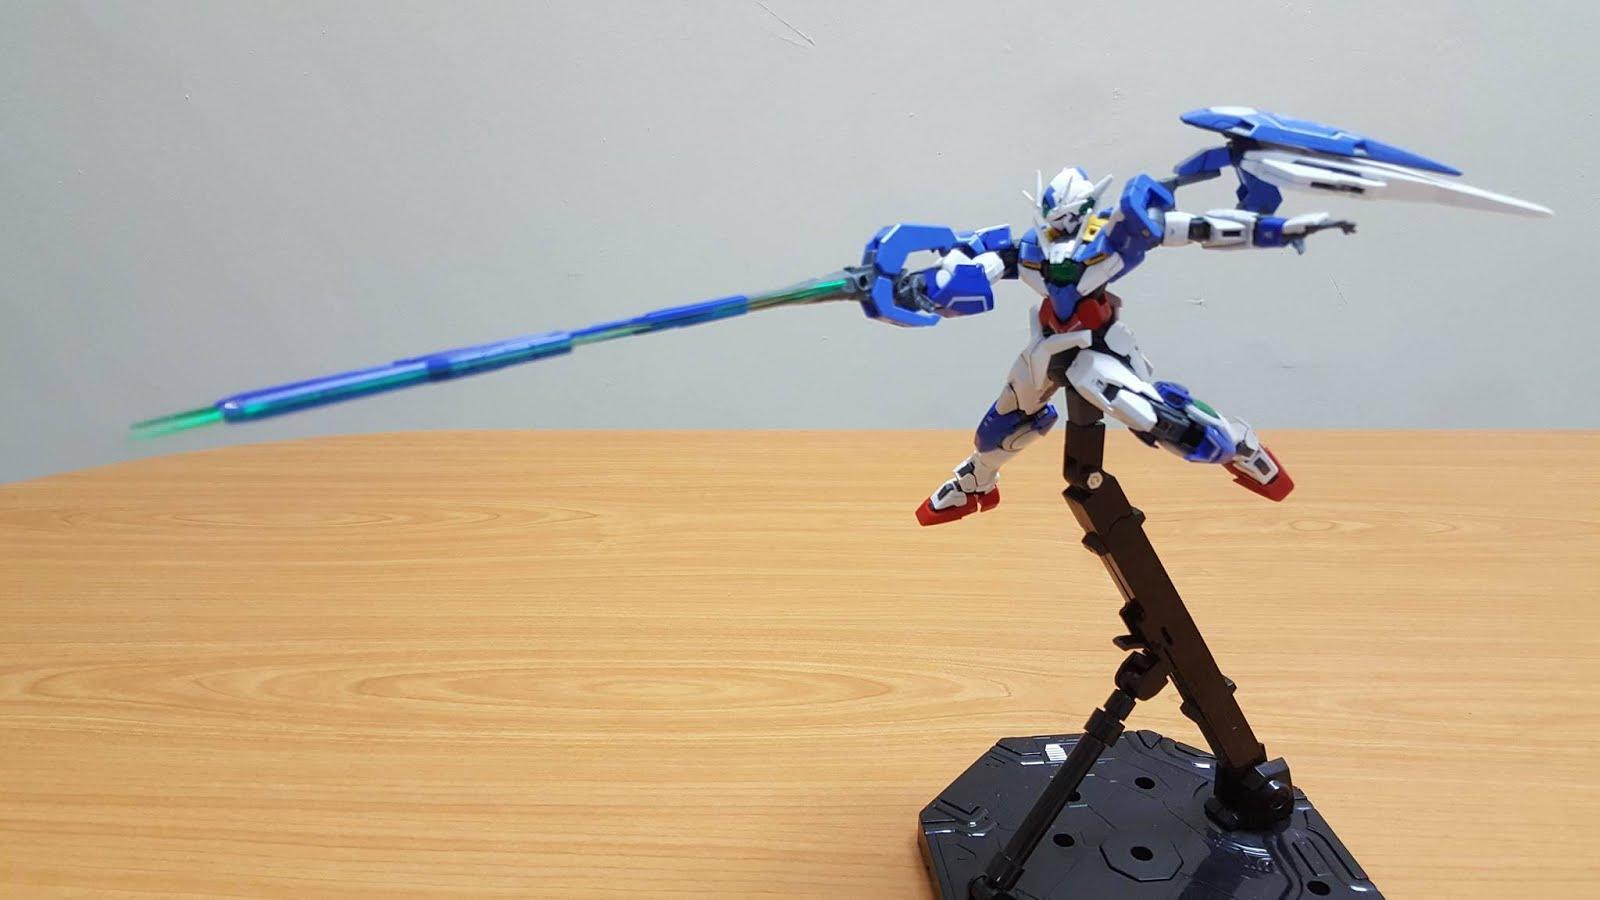 Rg 1 144 Gundam 00 Qant Review Blog Bandai Hgoo Gnt 0000 Qanta No Support Bruhs